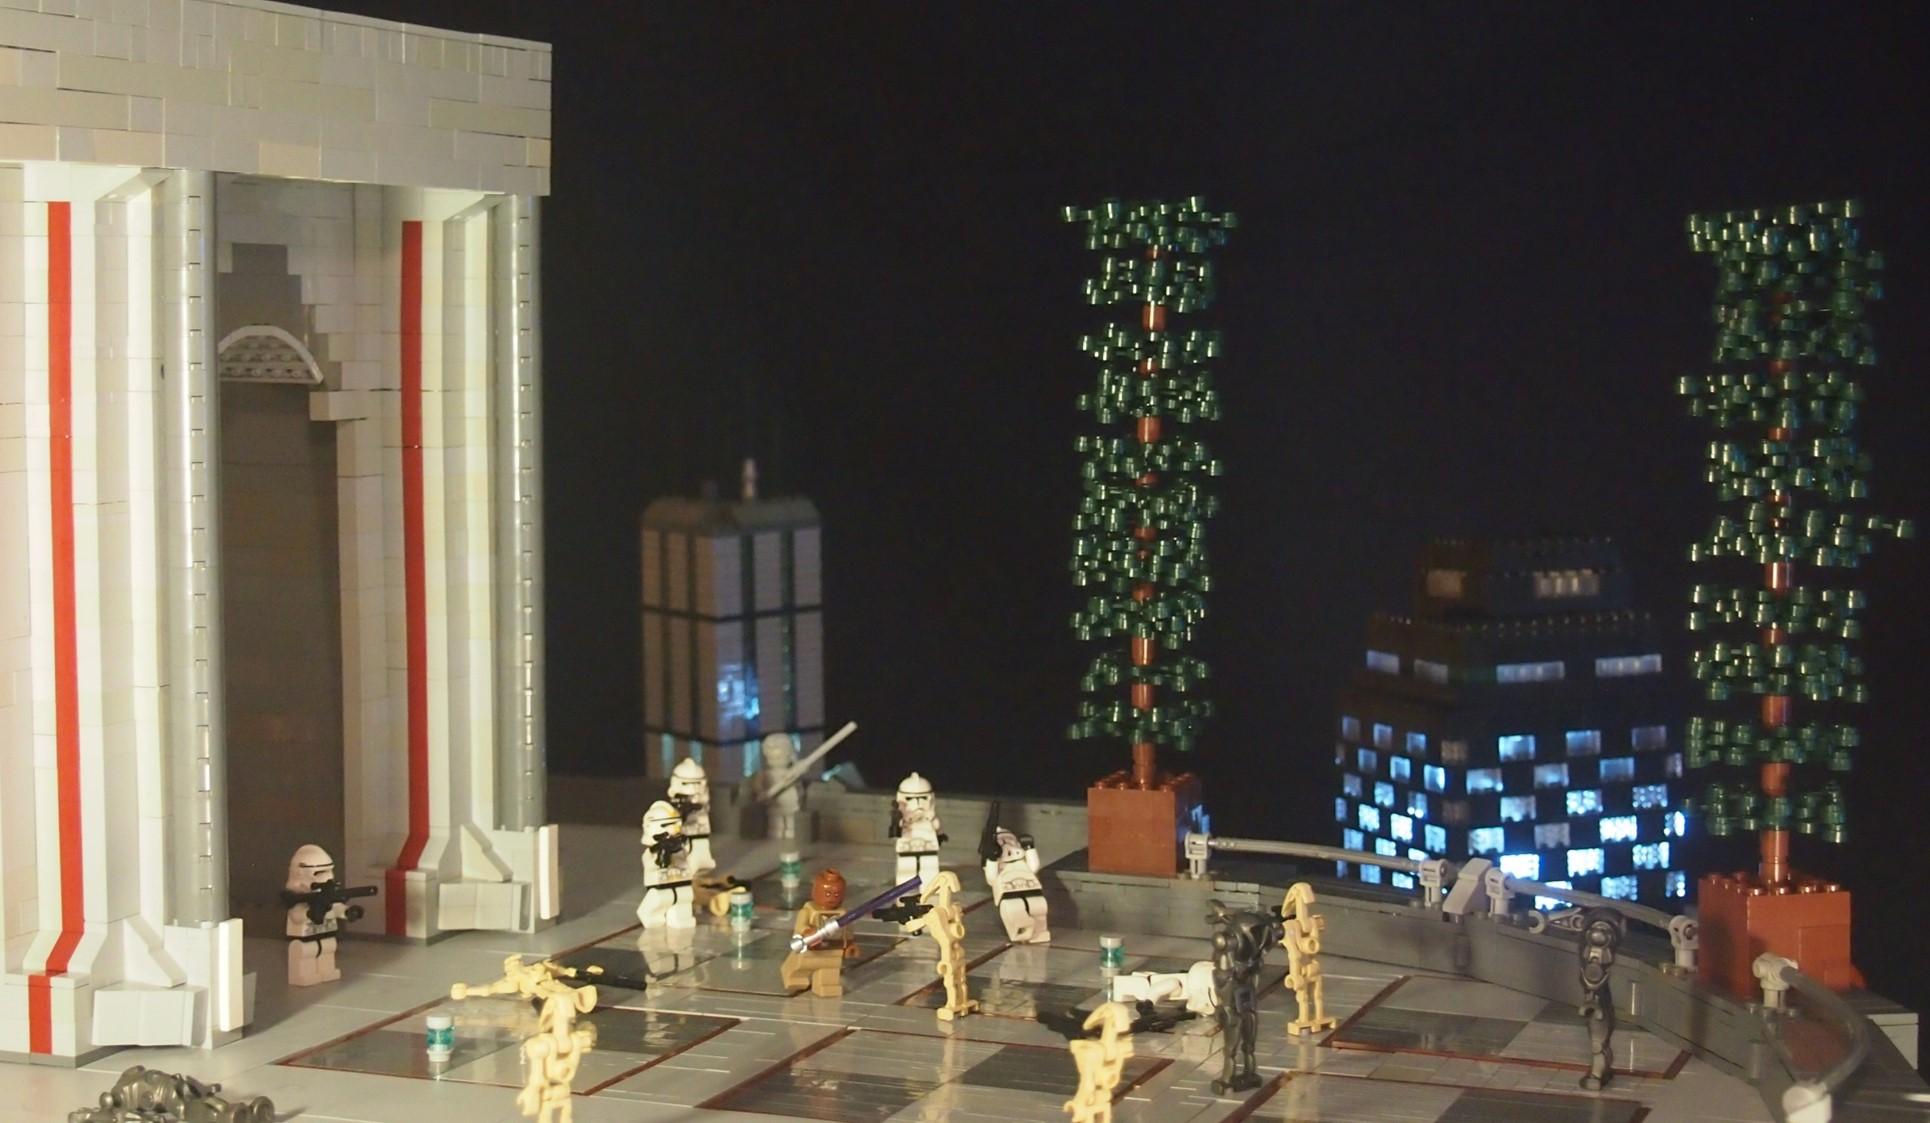 Wallpaper Temple War Battle Lego Map Jedi Coruscant Scene Star 2 Decor Wars Tourist Attraction Snot Clones Battlefront Droids 1930x1123 819210 Hd Wallpapers Wallhere